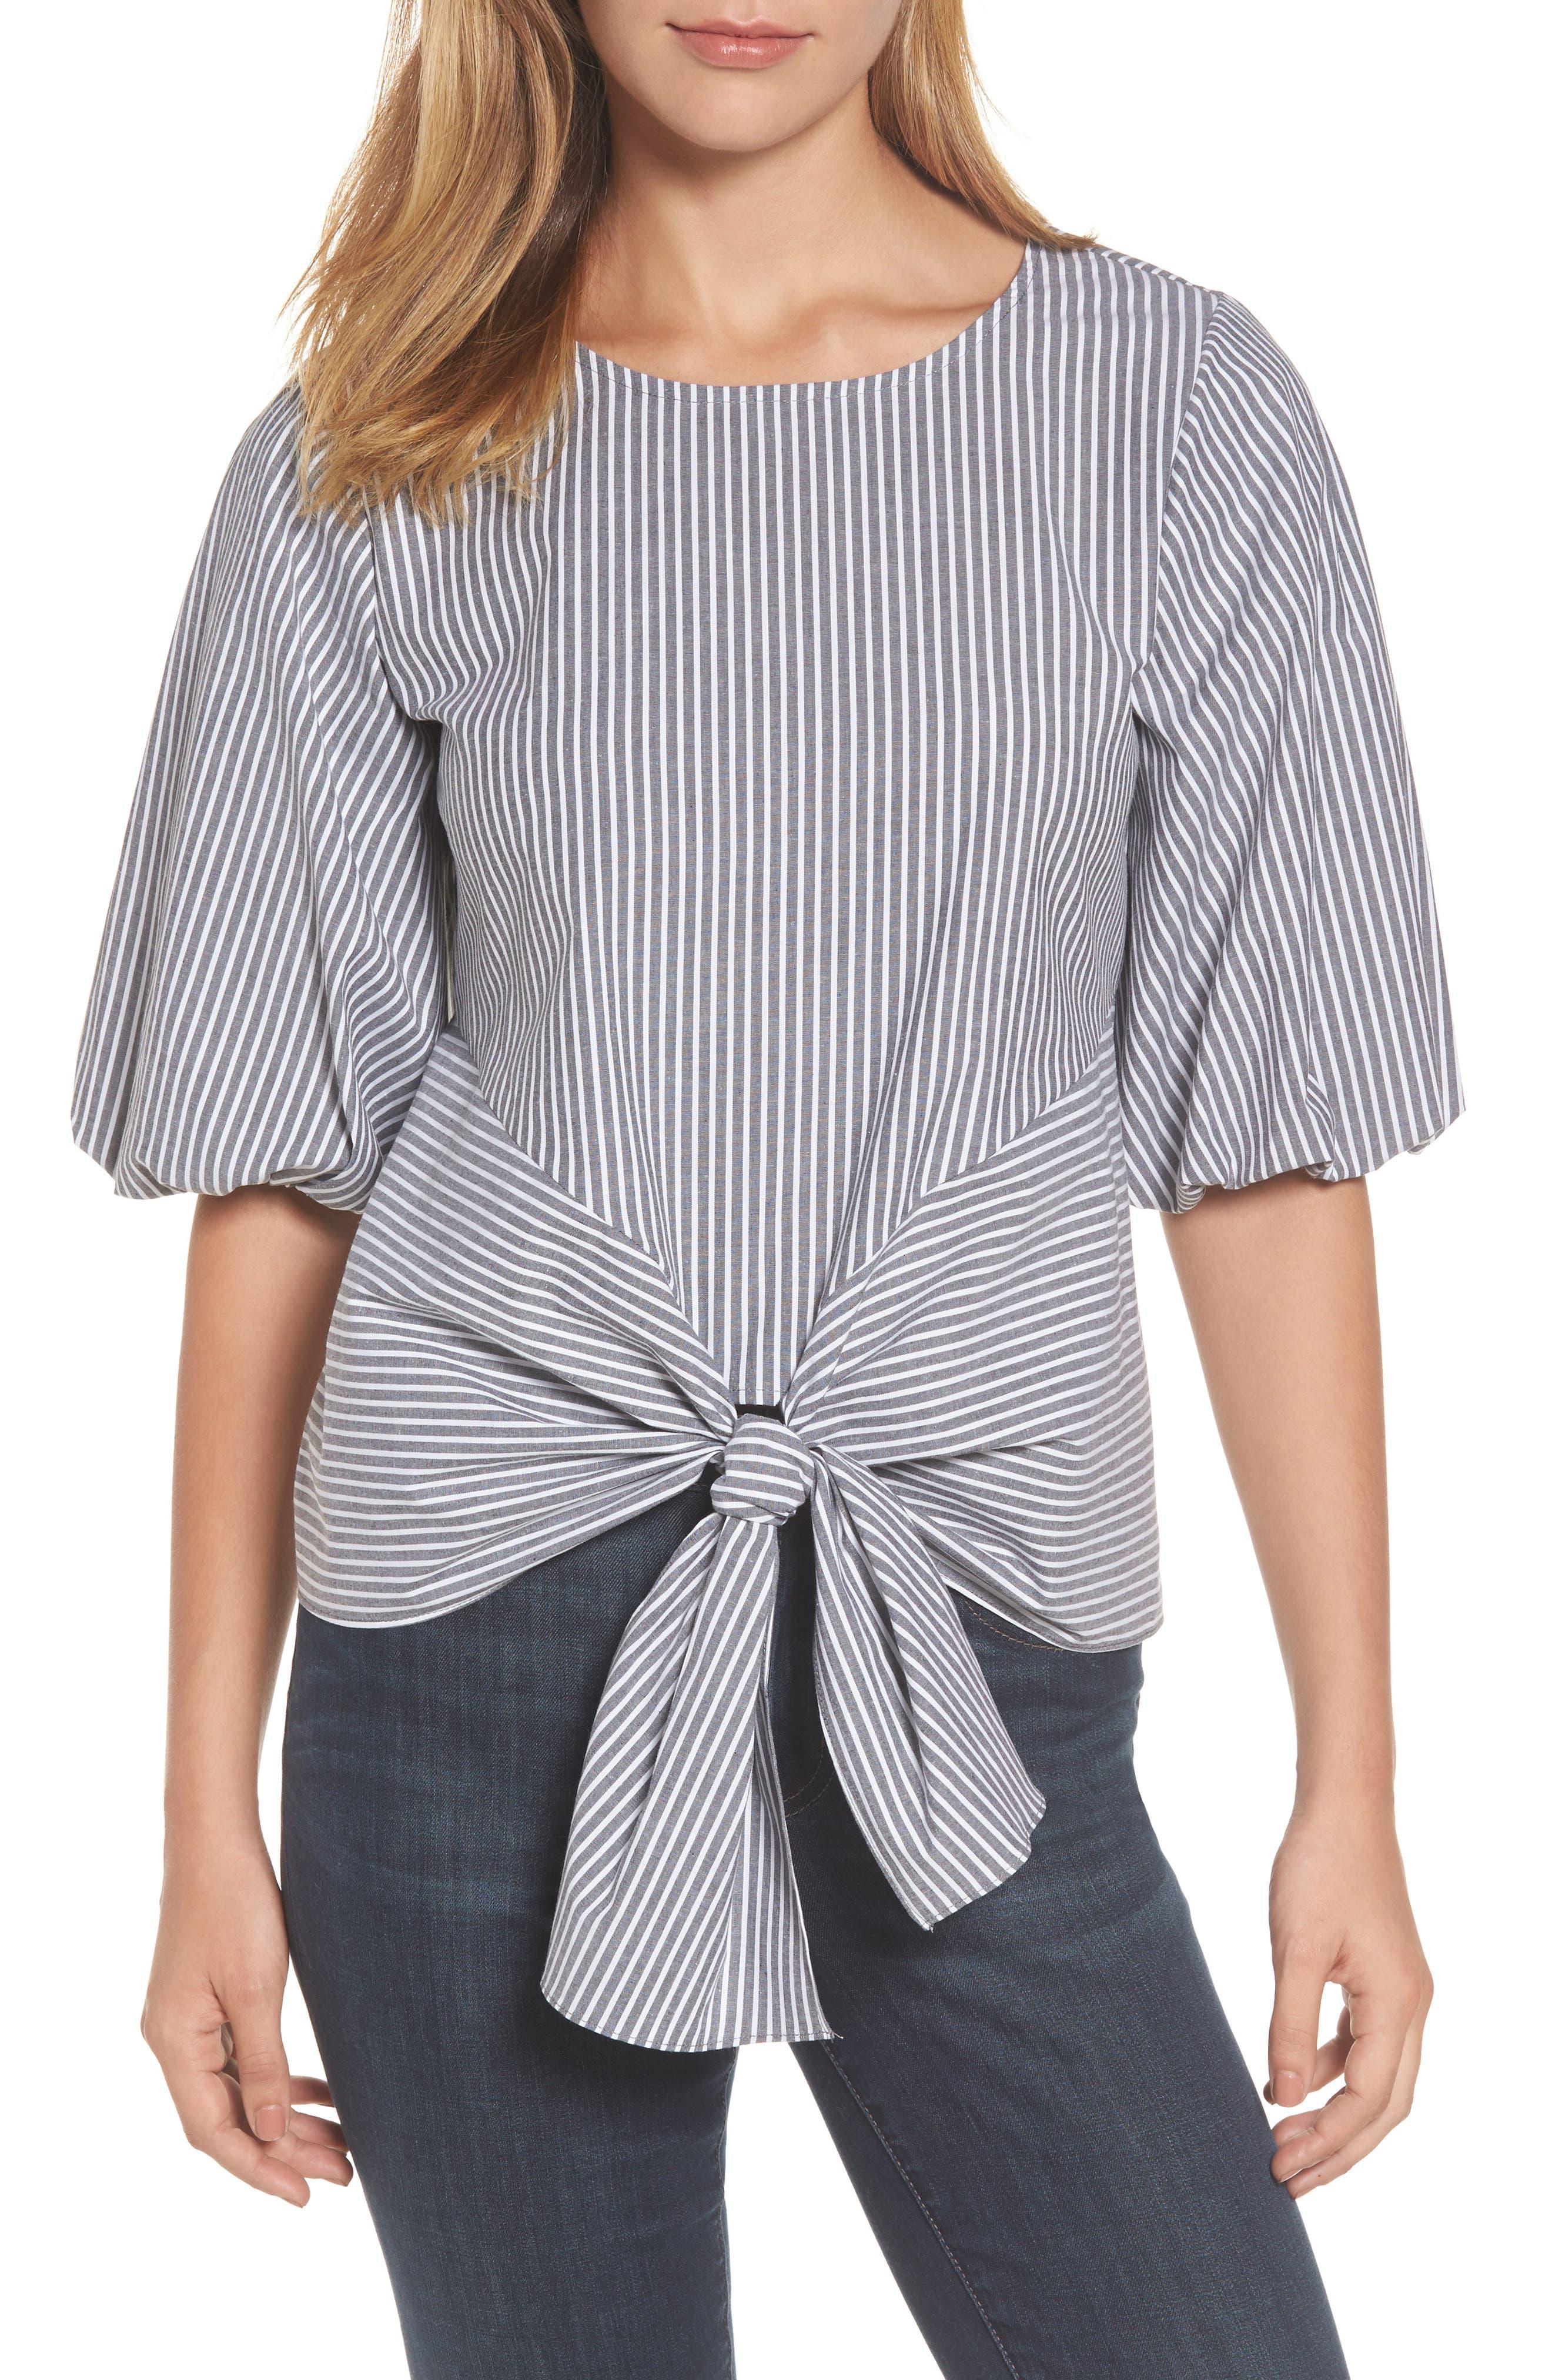 Bubble Sleeve Tie Front Top,                         Main,                         color, Black/ White